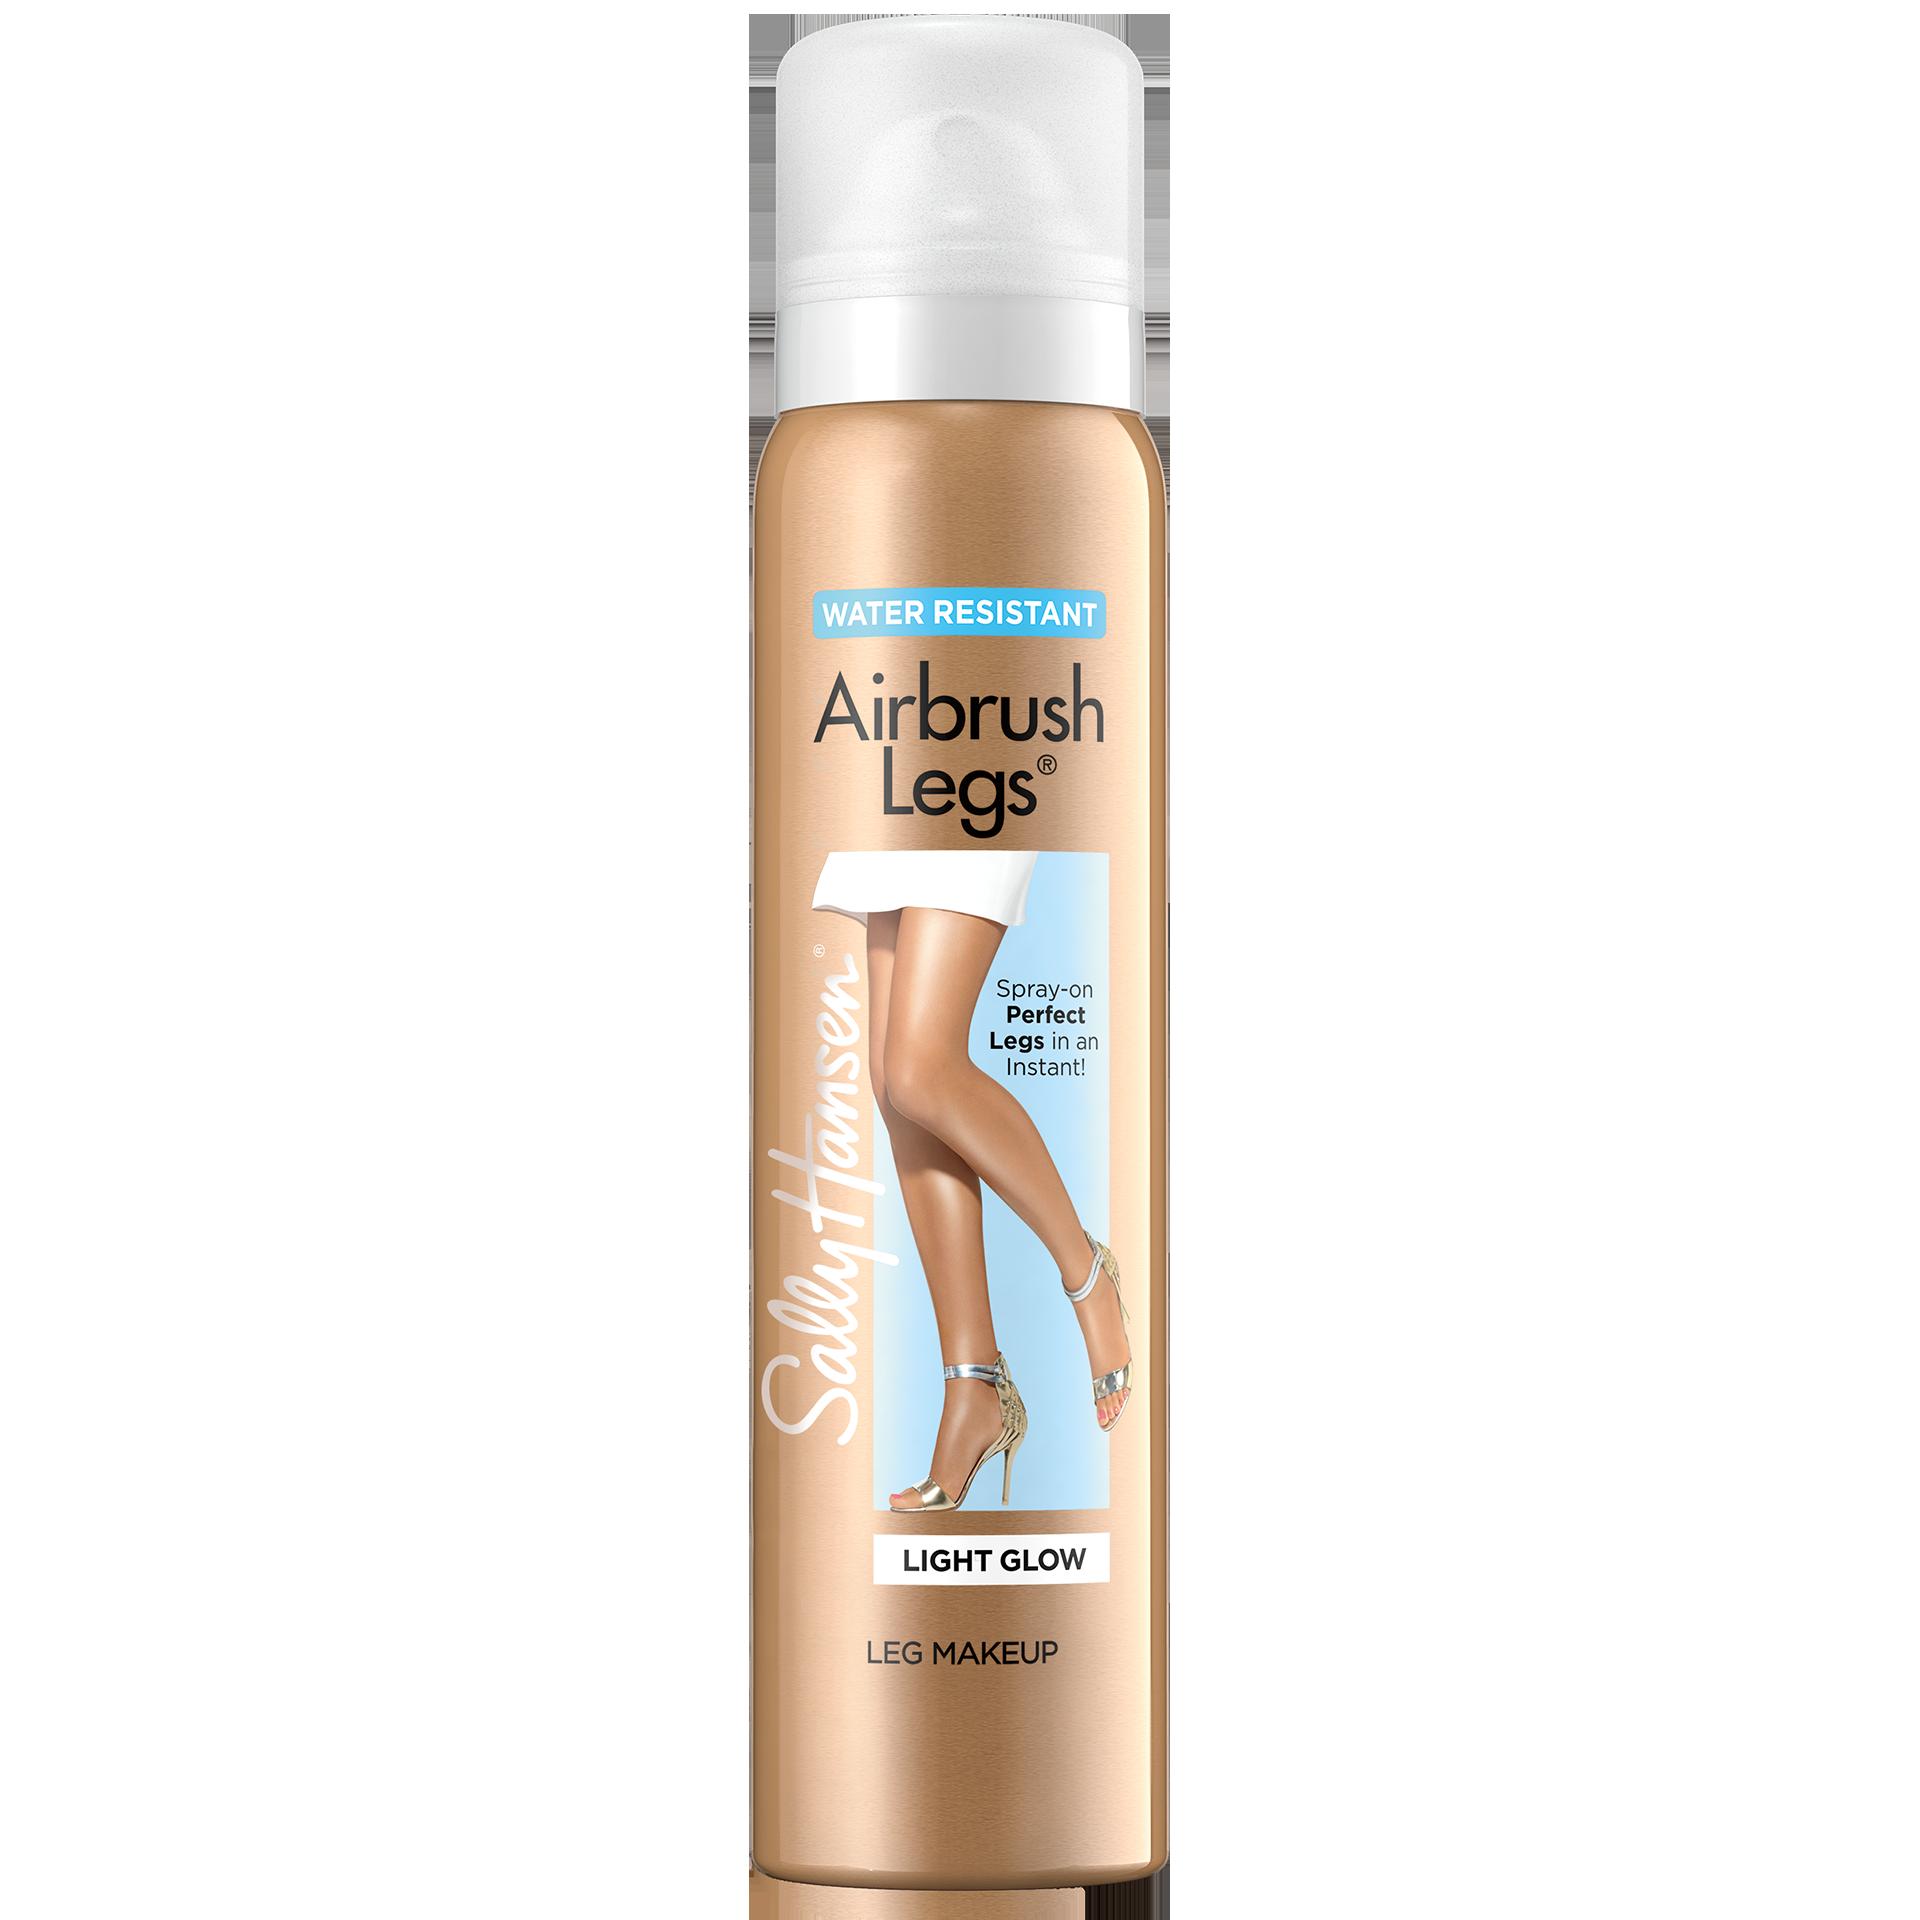 Airbrush Legs Spray - Leg Makeup in Light Glow by Sally Hansen